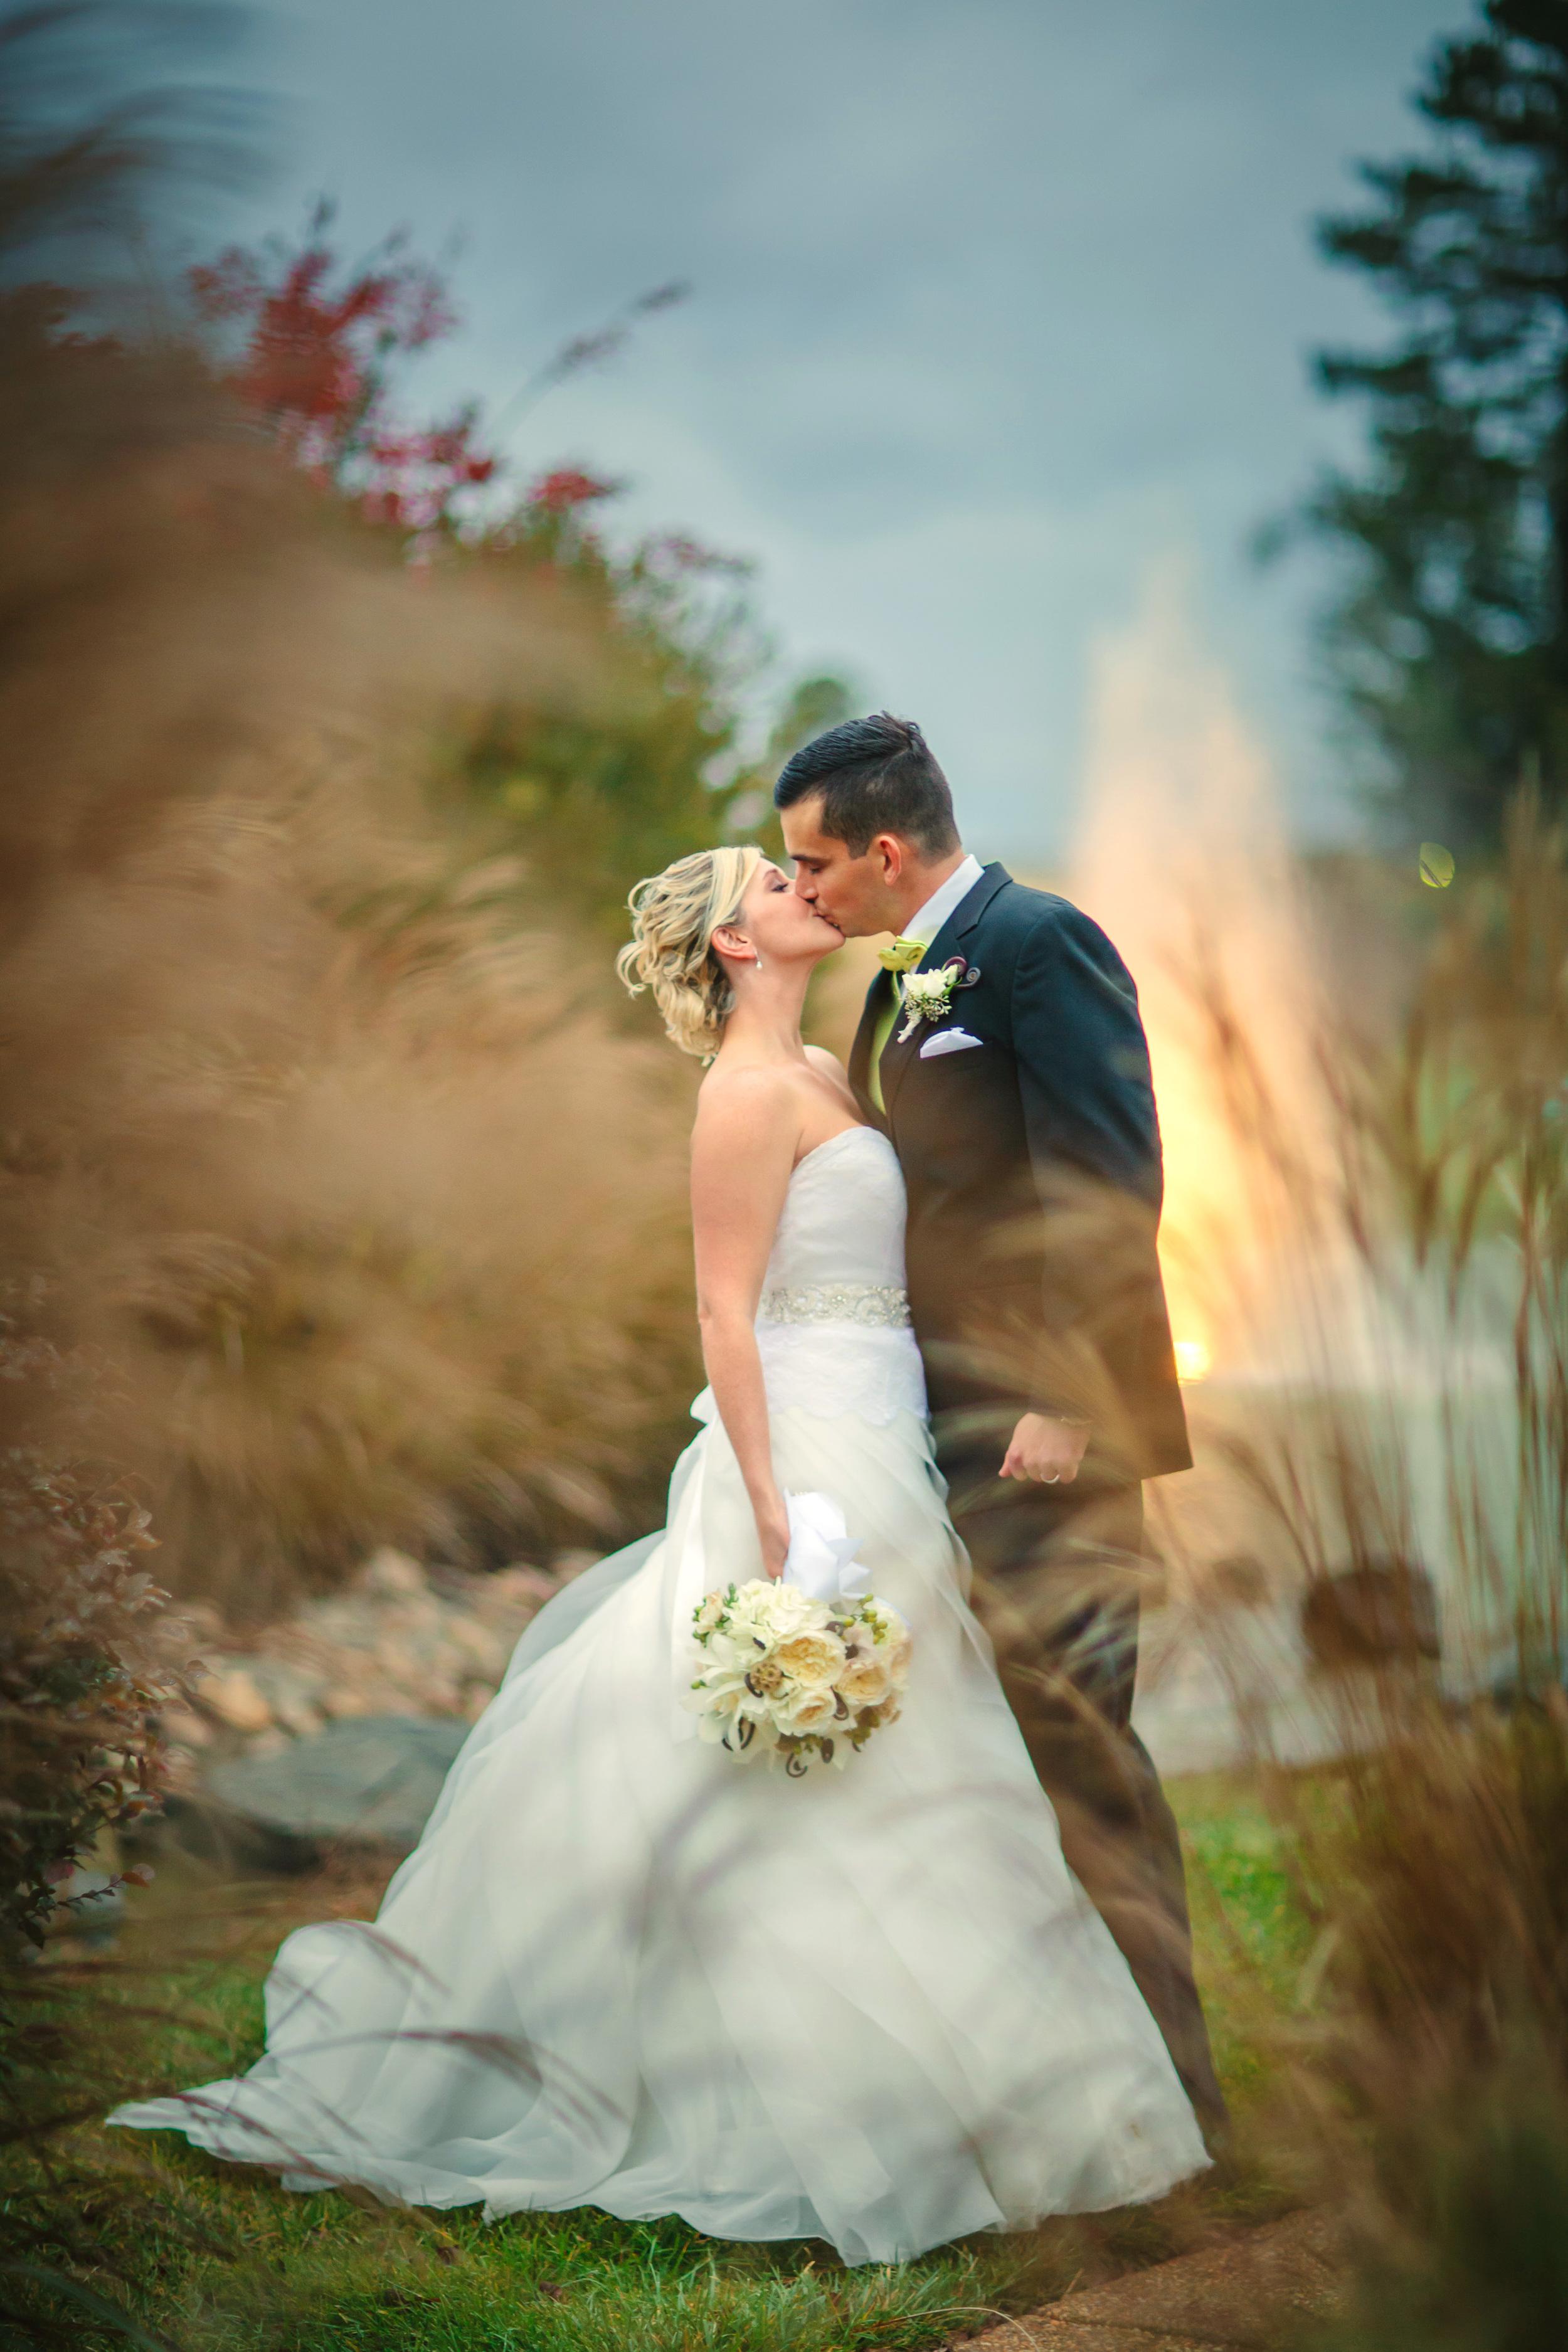 dreamclip films | wedding Co. of Williamsburg LLC | kudos